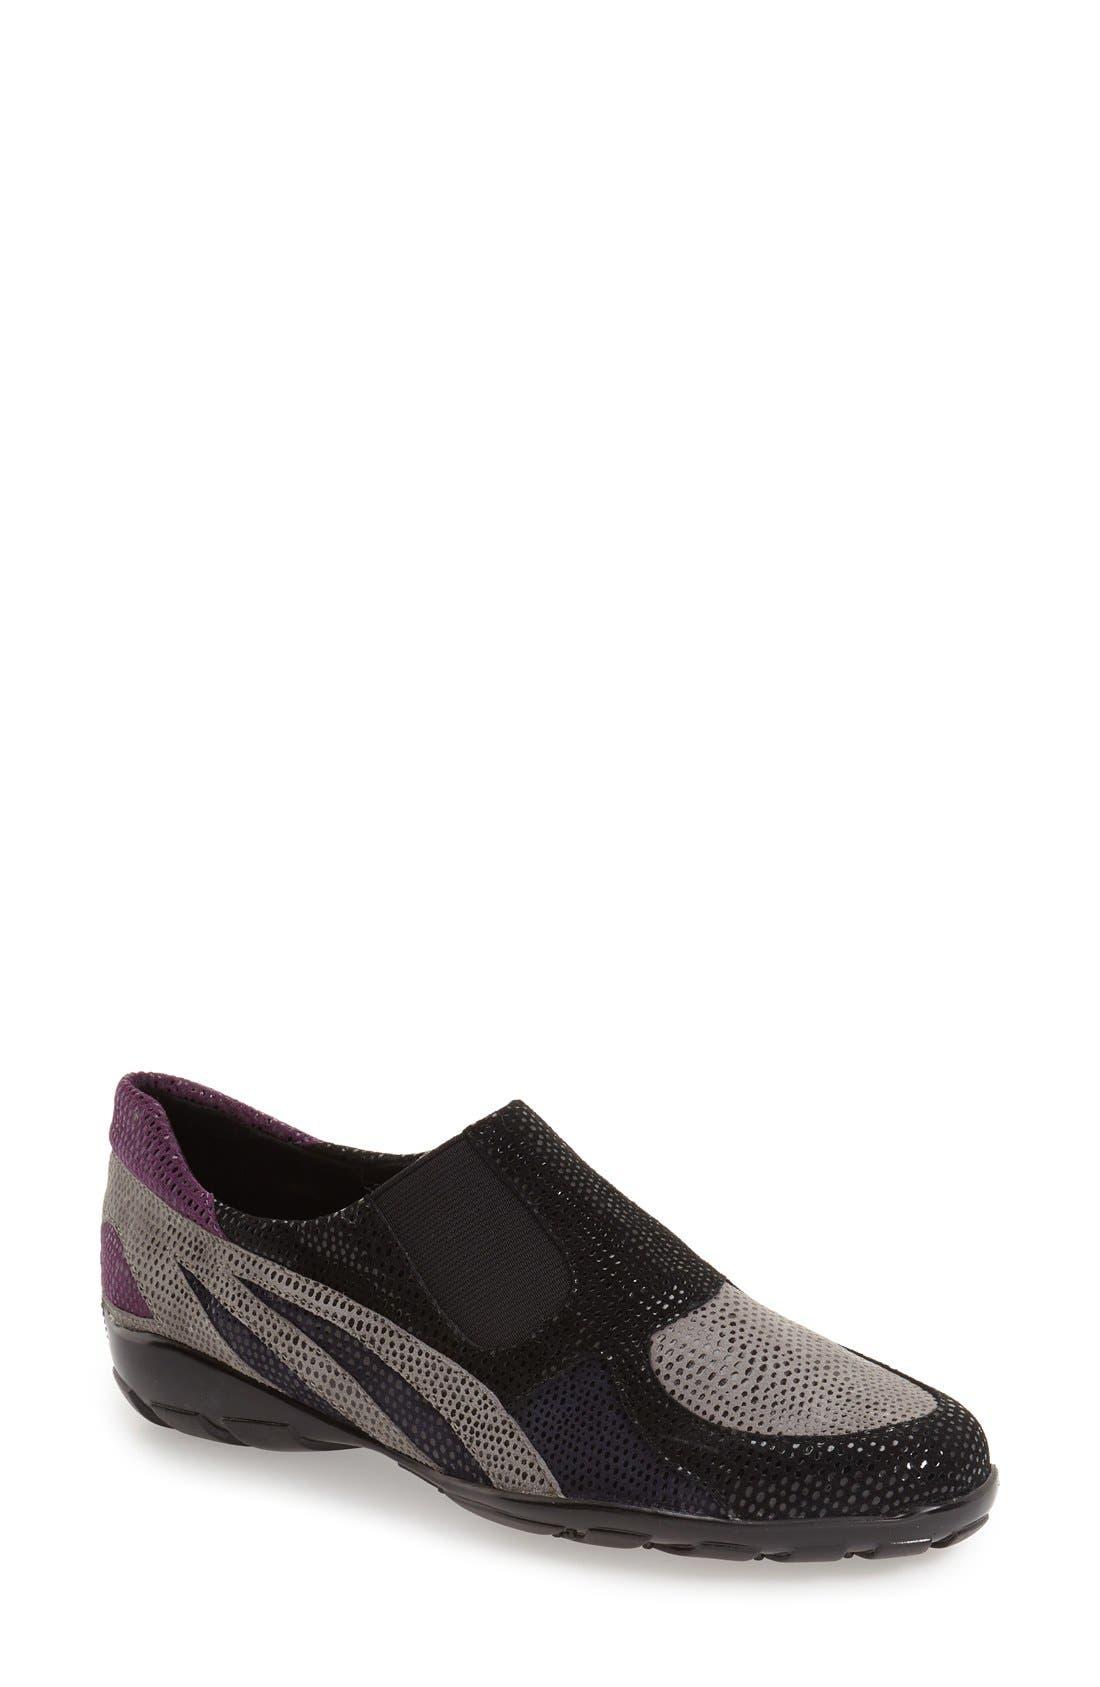 'Atte' Sneaker,                         Main,                         color, 001